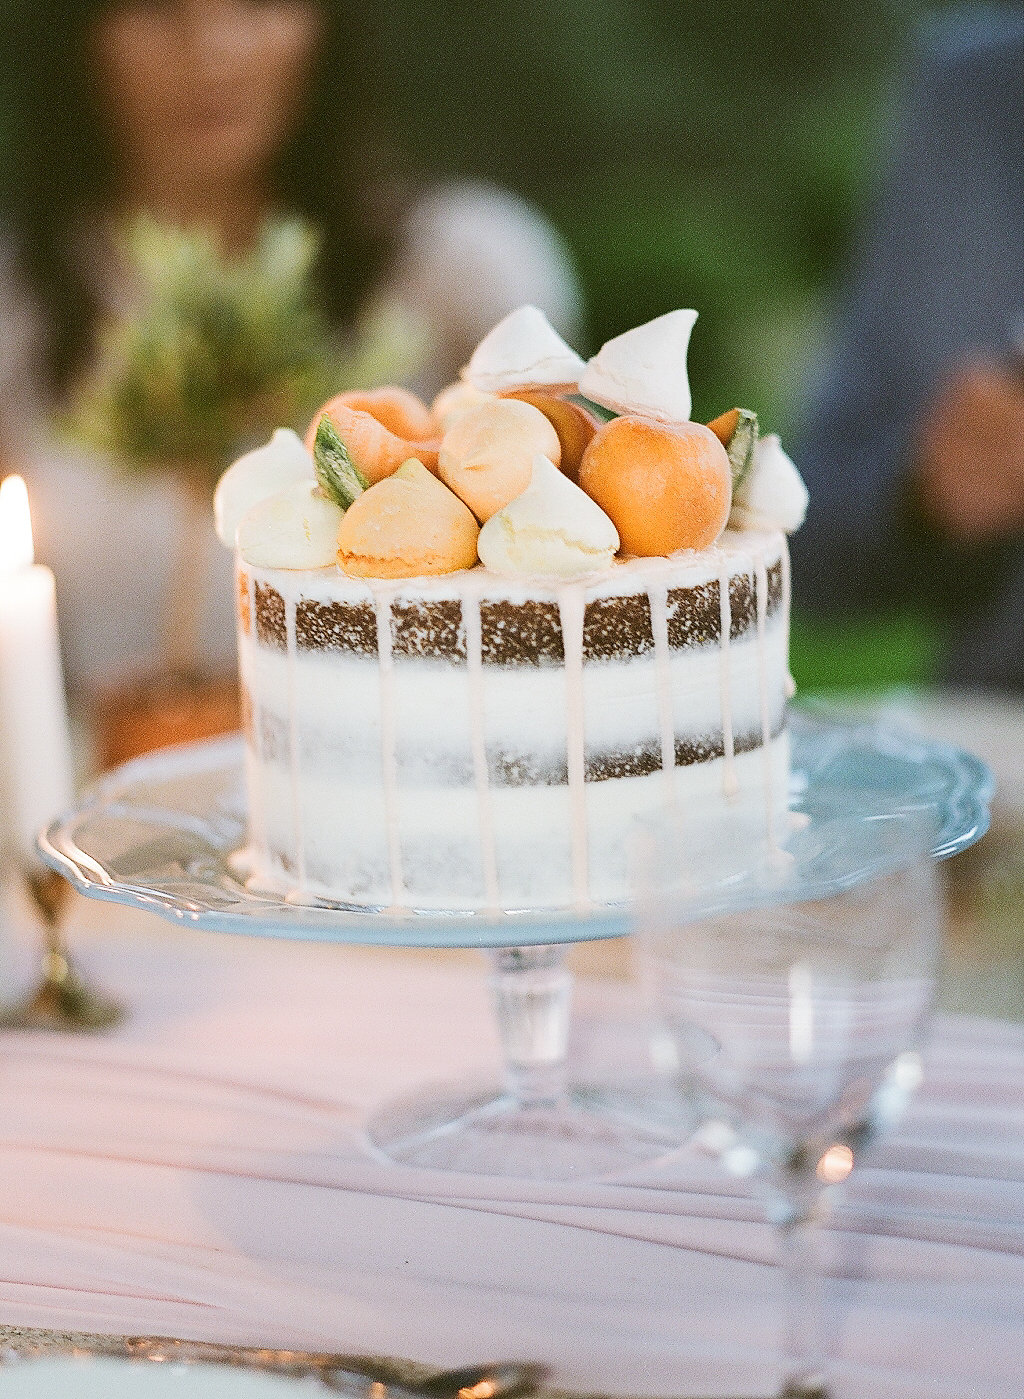 le coeur dans les etoiles - wedding planner - provence - luberon - alpilles - drome - vaucluse - sardaigne - italie - organisation - mariage - shooting - dolce vita - valery villard-456